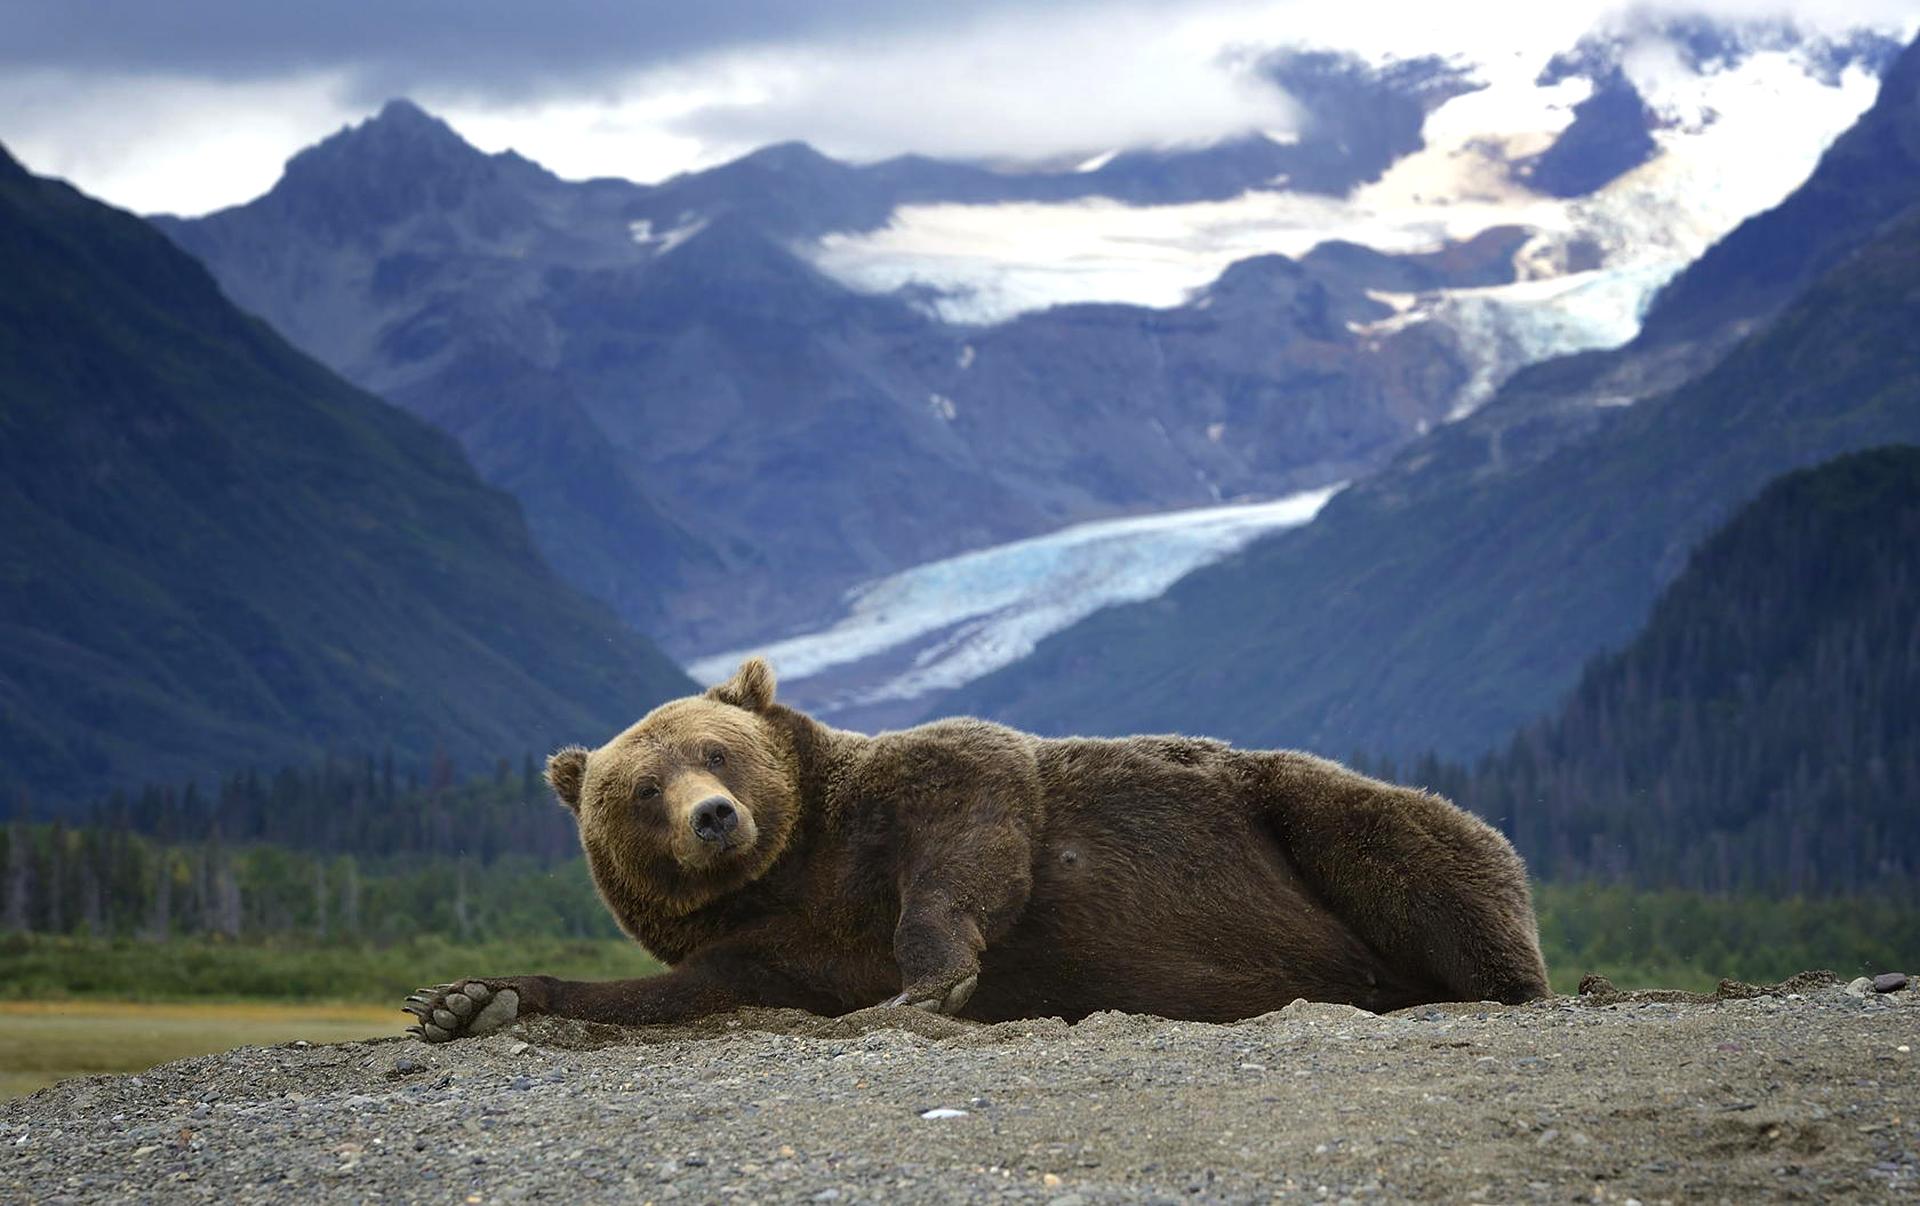 Alaskan Brown Bear Silhouetted Against Mount Katolinat, Alaska  № 1442544  скачать